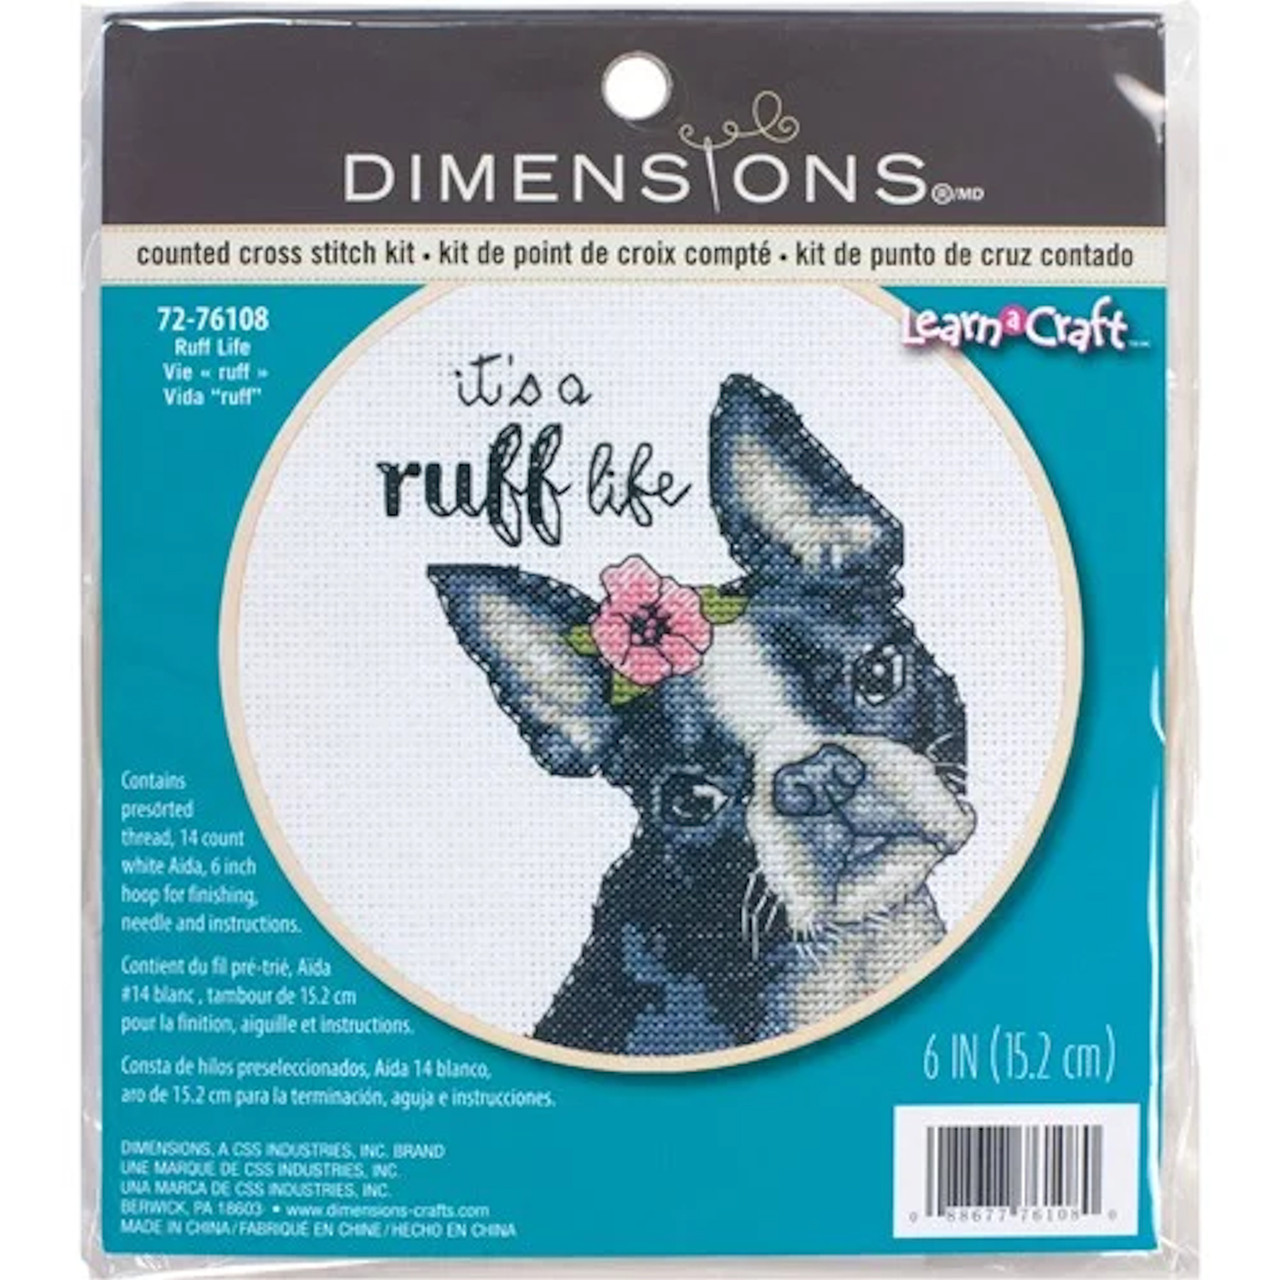 Dimensions Learn a Craft - Ruff Life